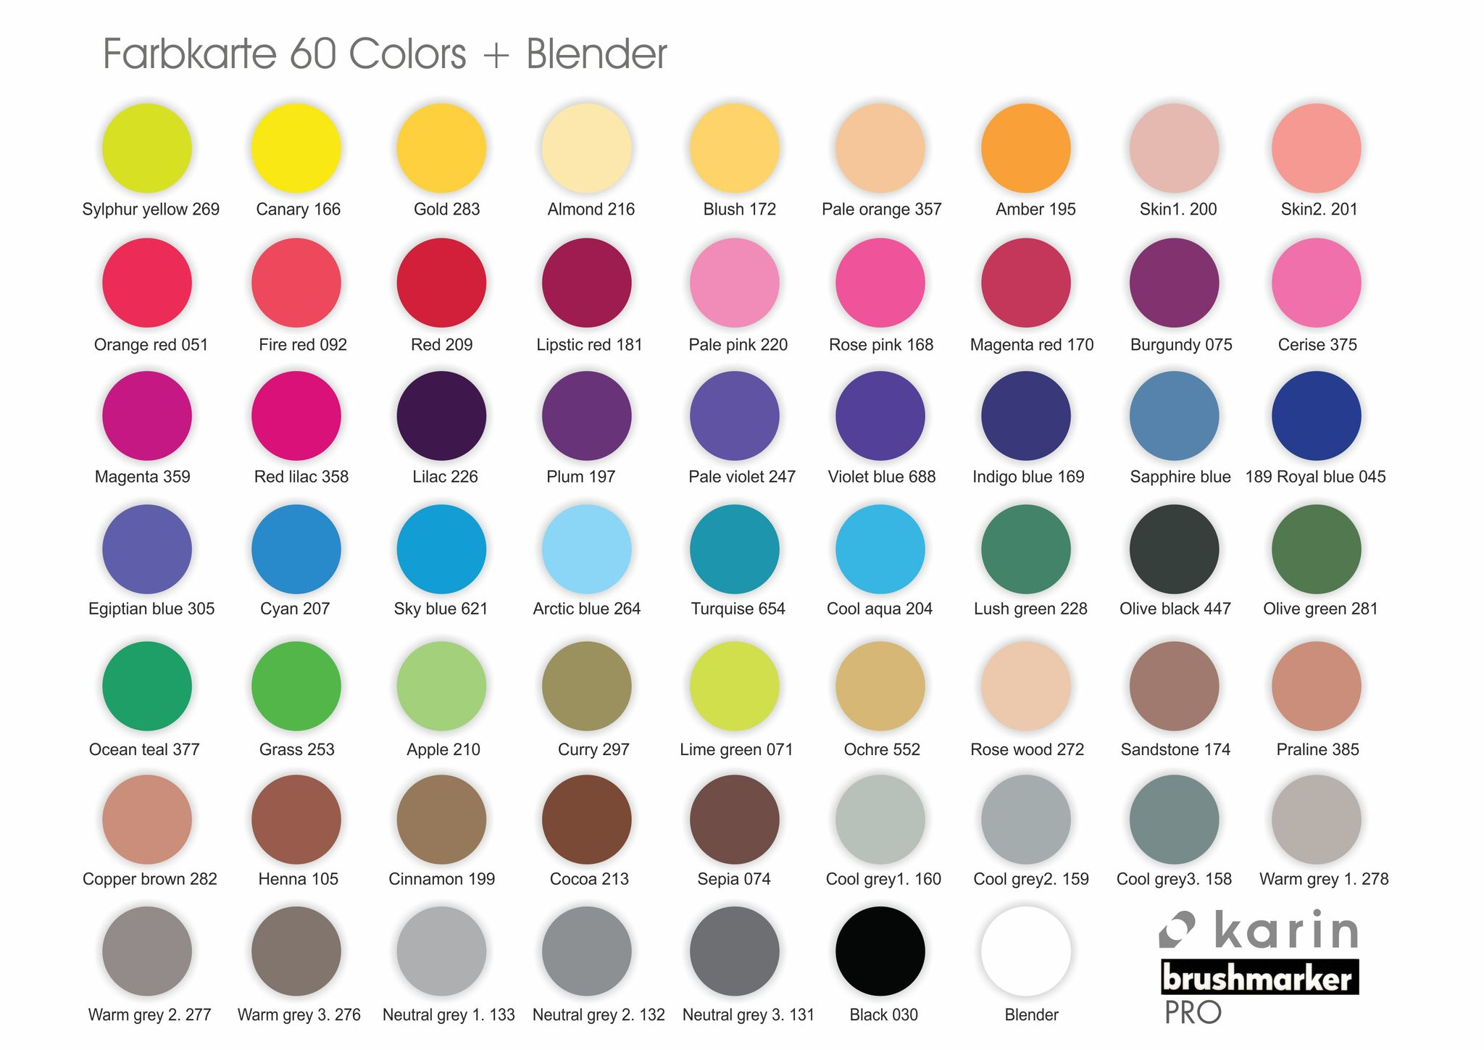 Karin Brushmarker PRO color chart